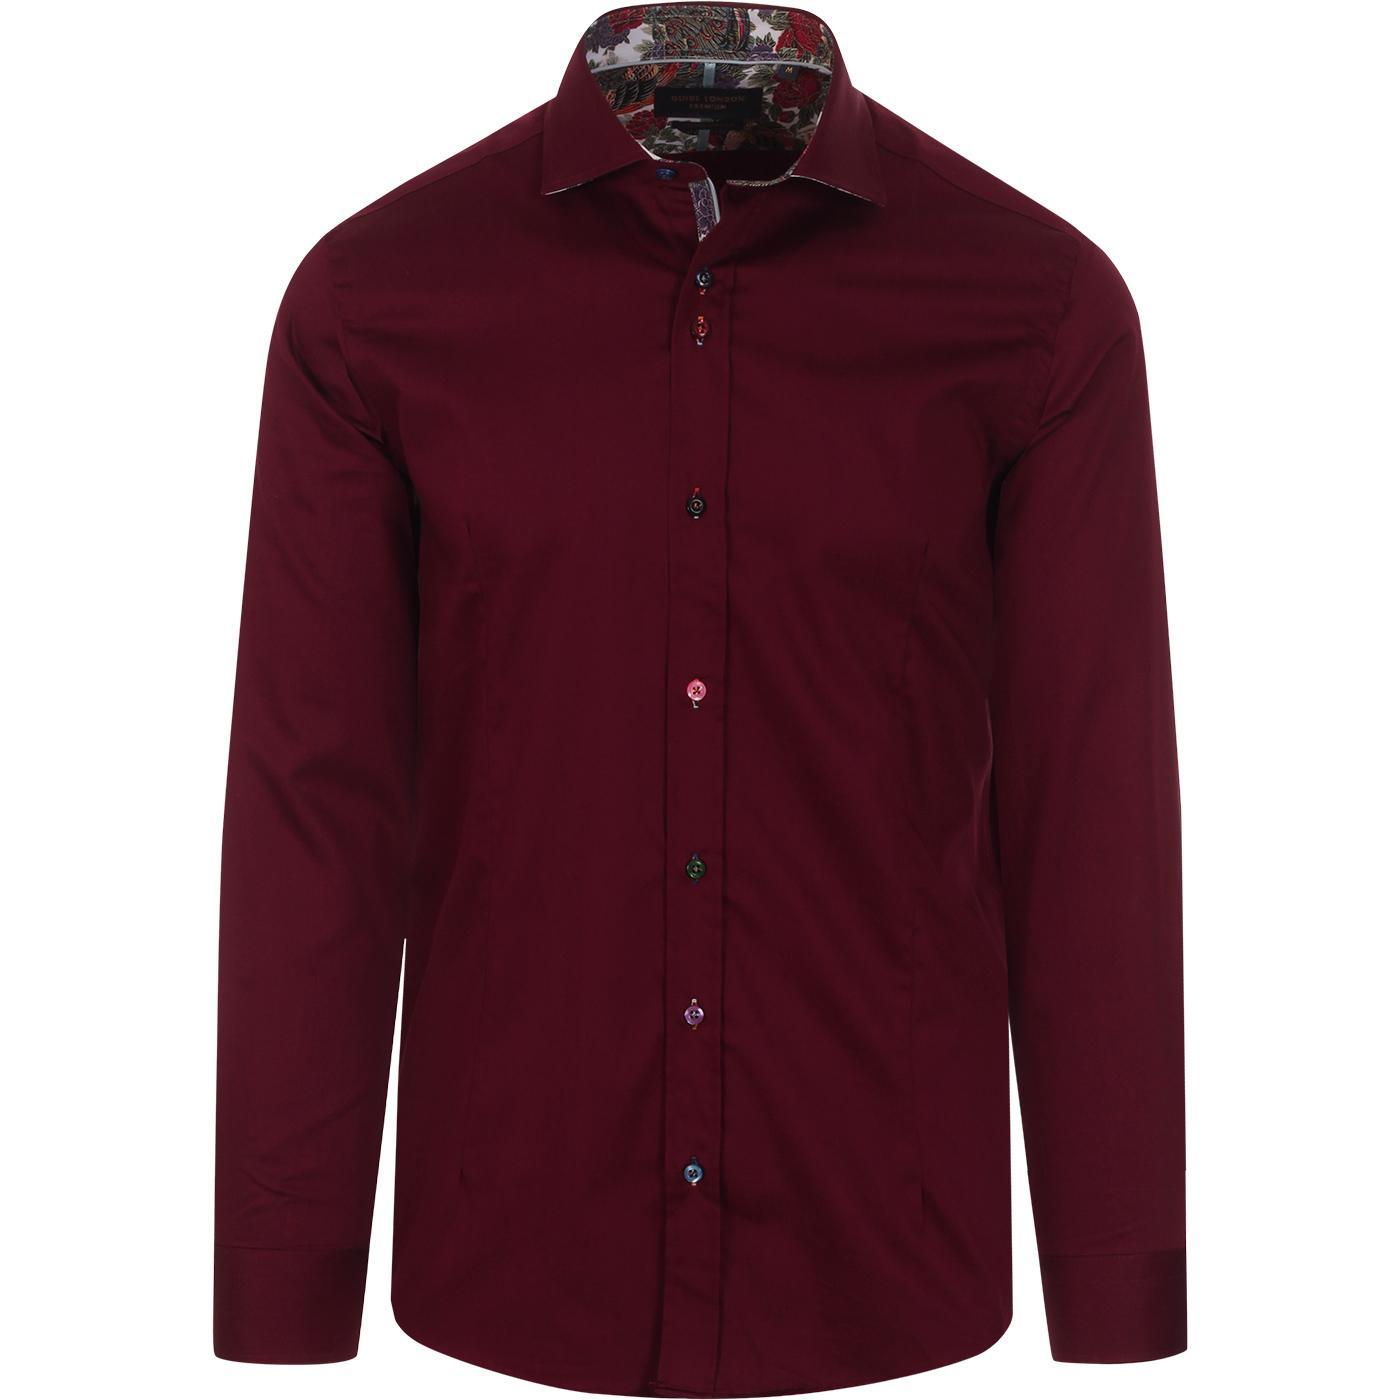 GUIDE LONDON Classic Mod Plain Shirt (Burgundy)